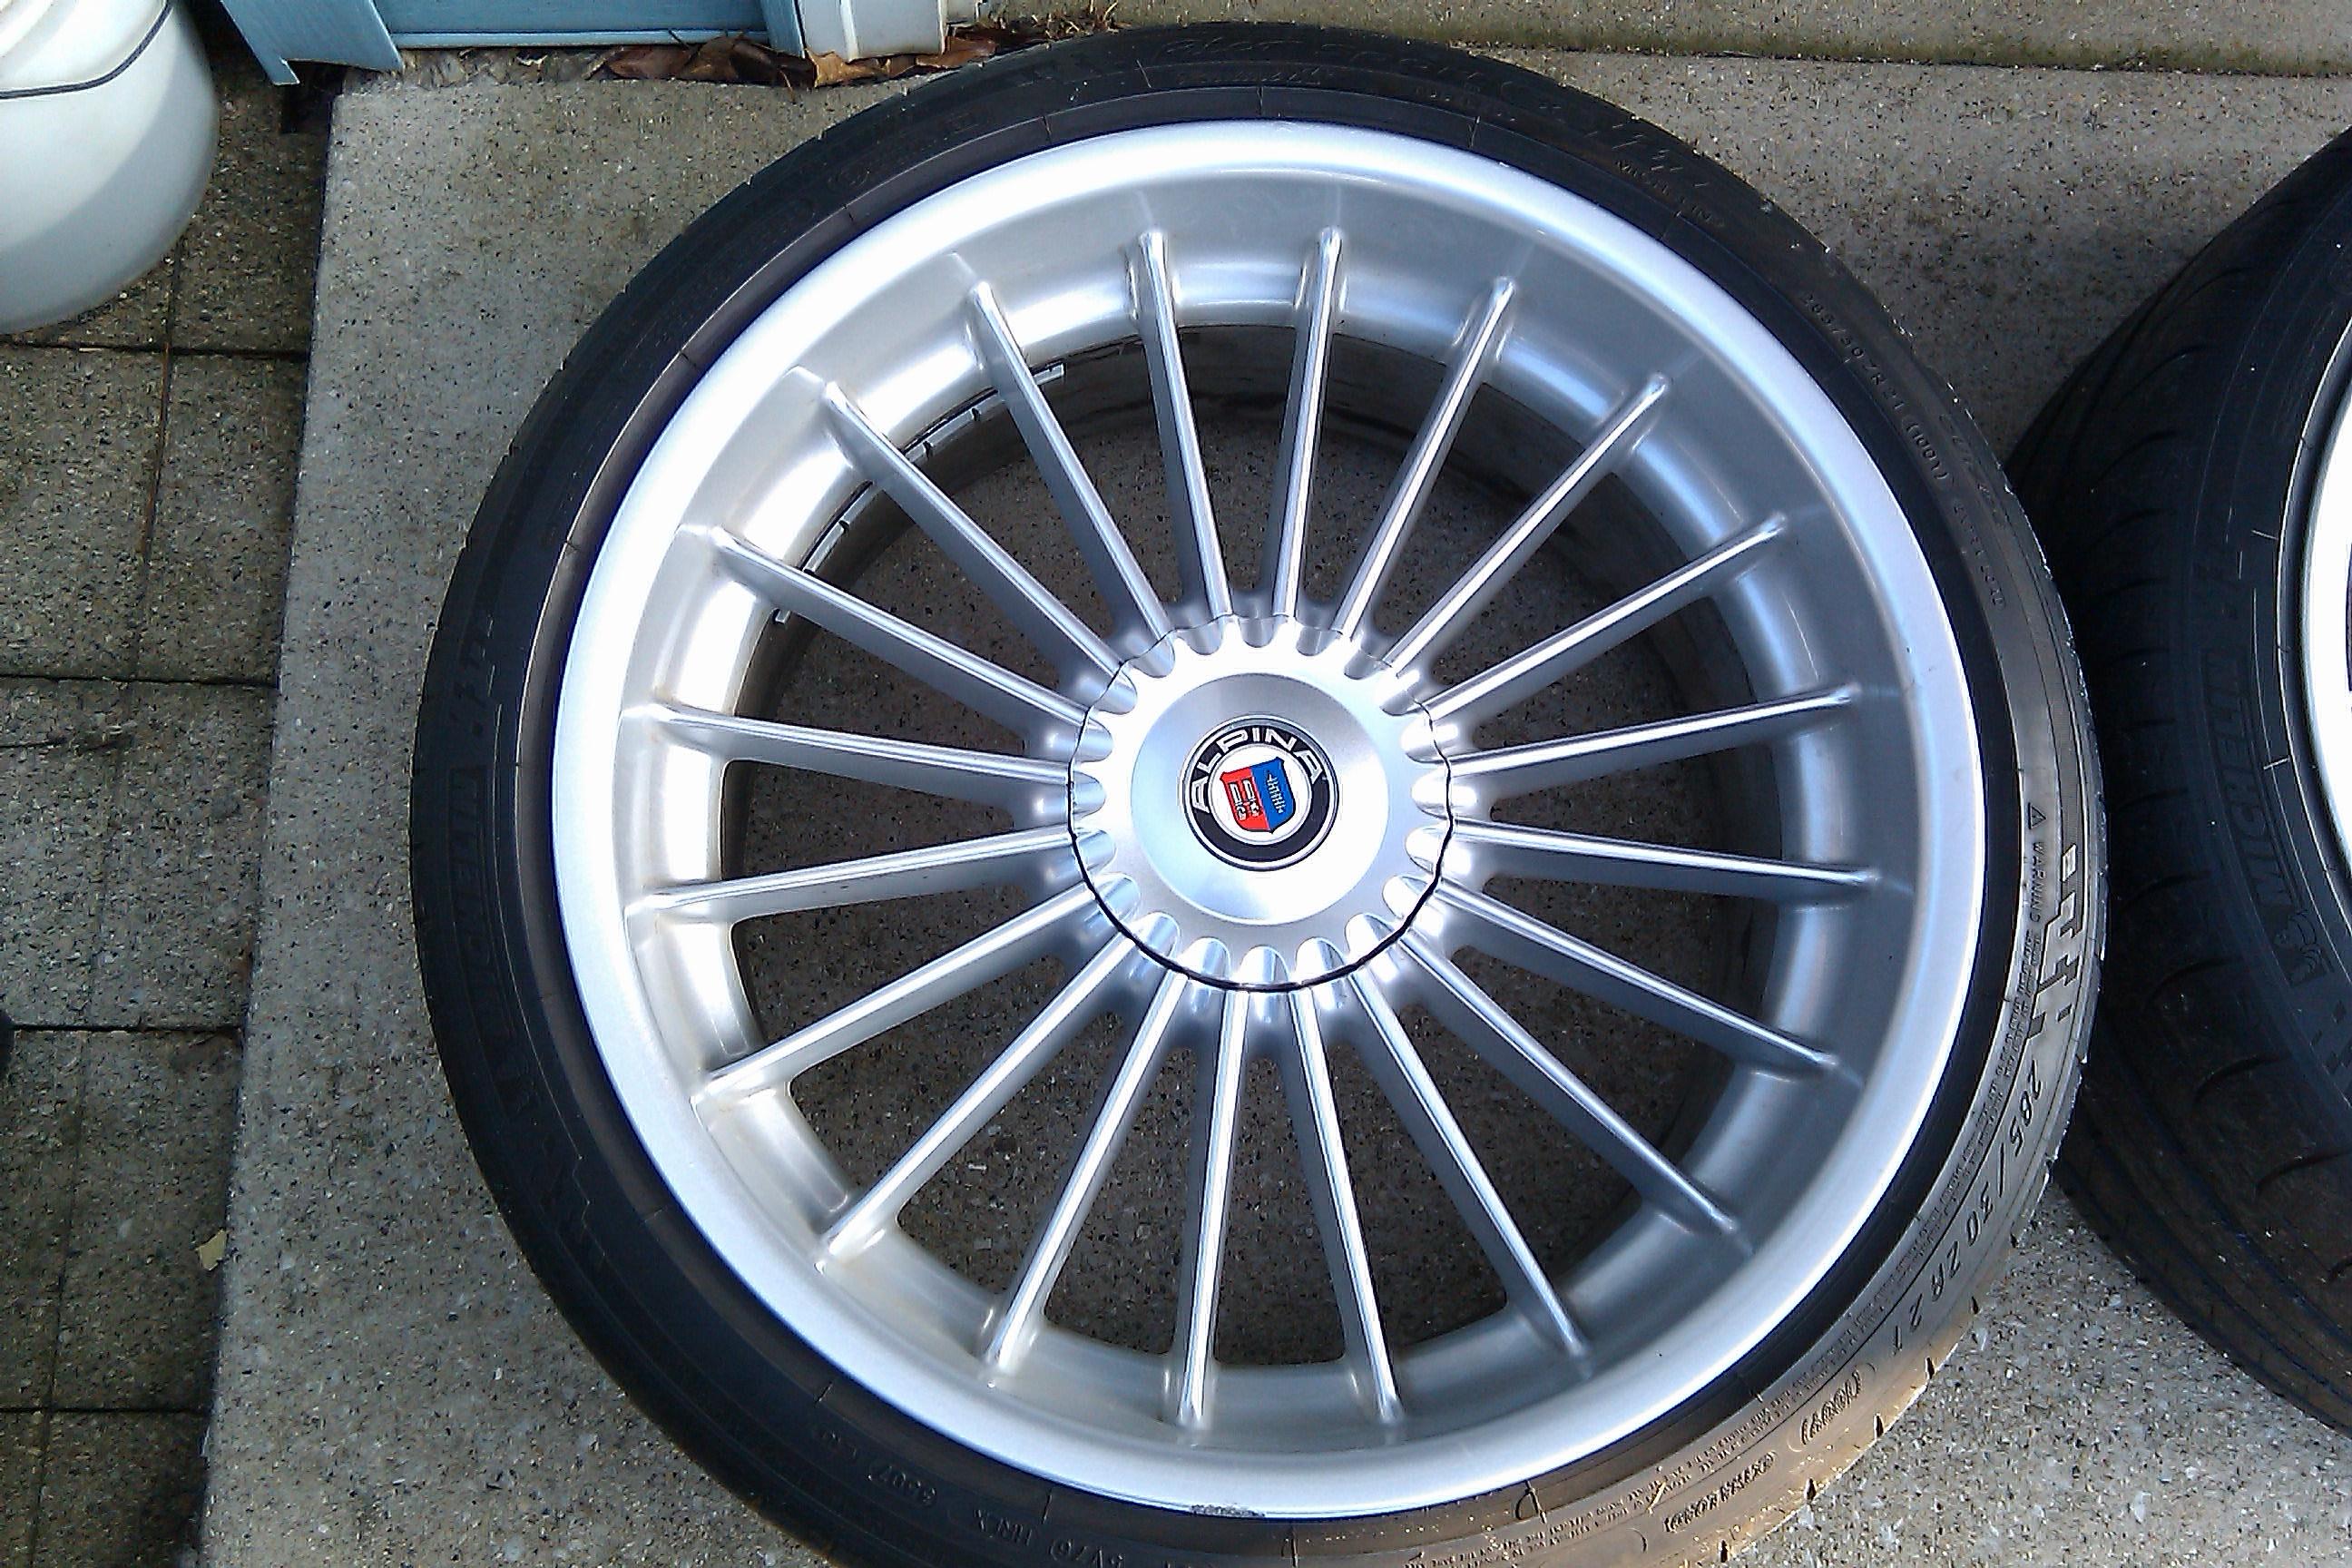 "ALPINA For Sale 21"" Orignal Alpina Wheels with Tires - BMW M5 Forum ..."